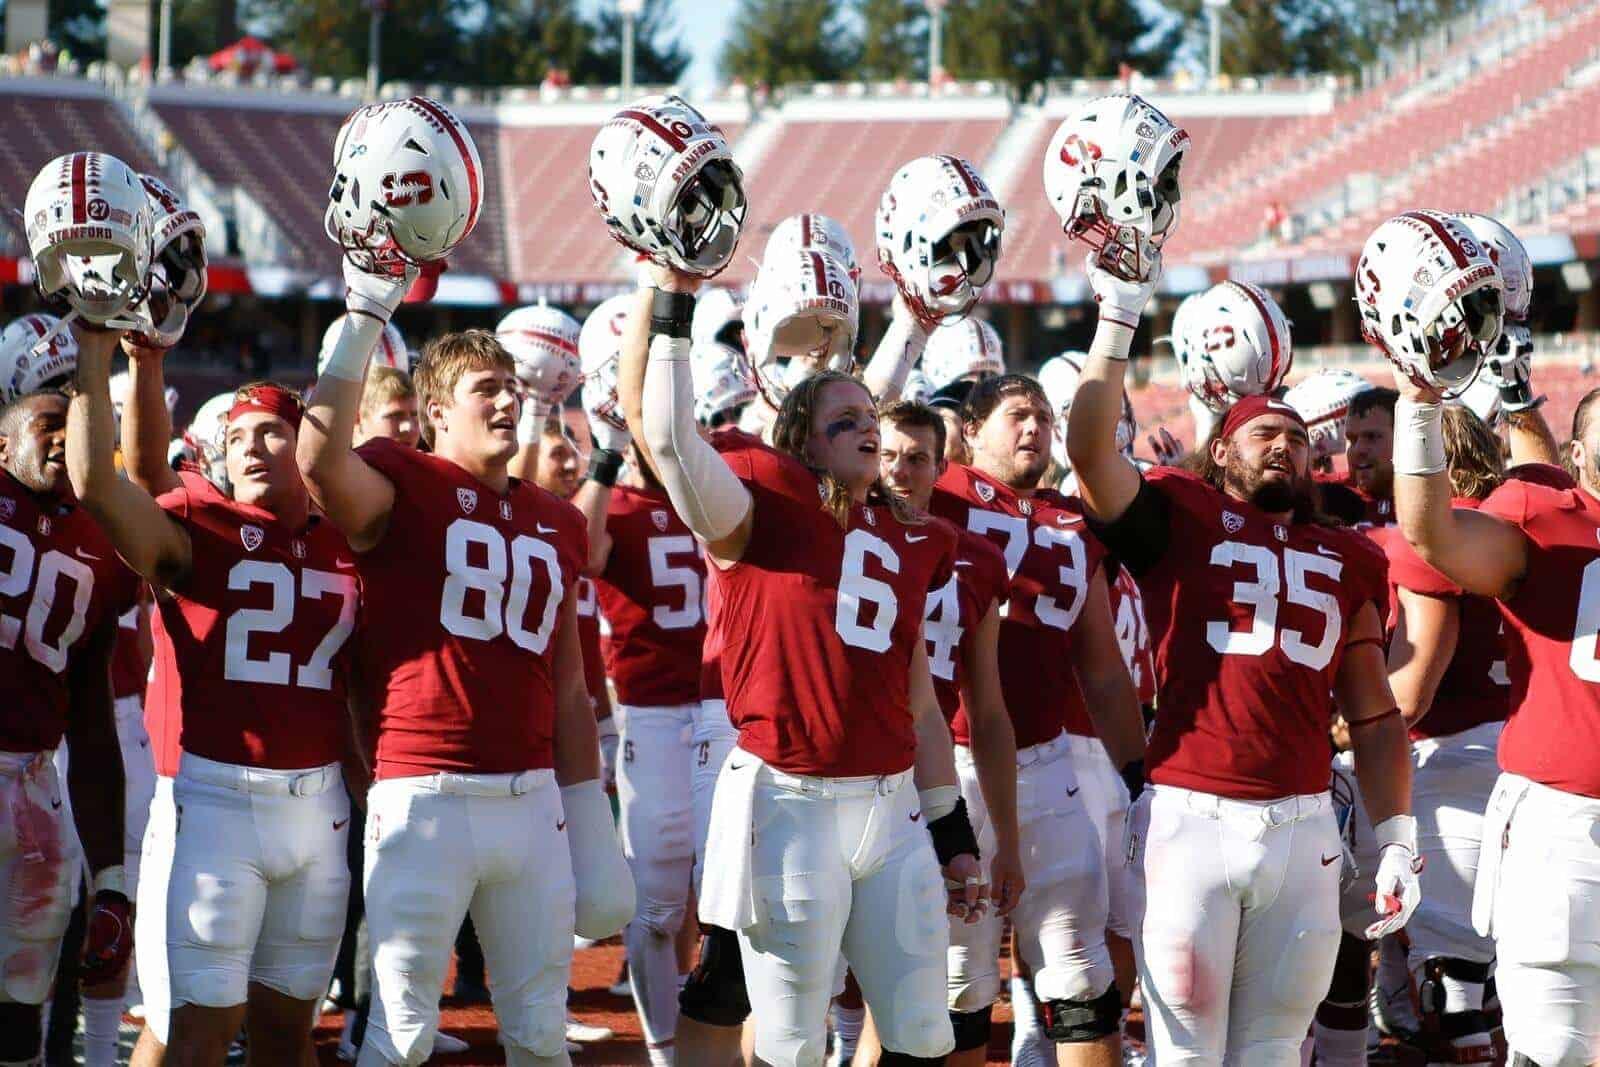 College Football Schedule: Stanford